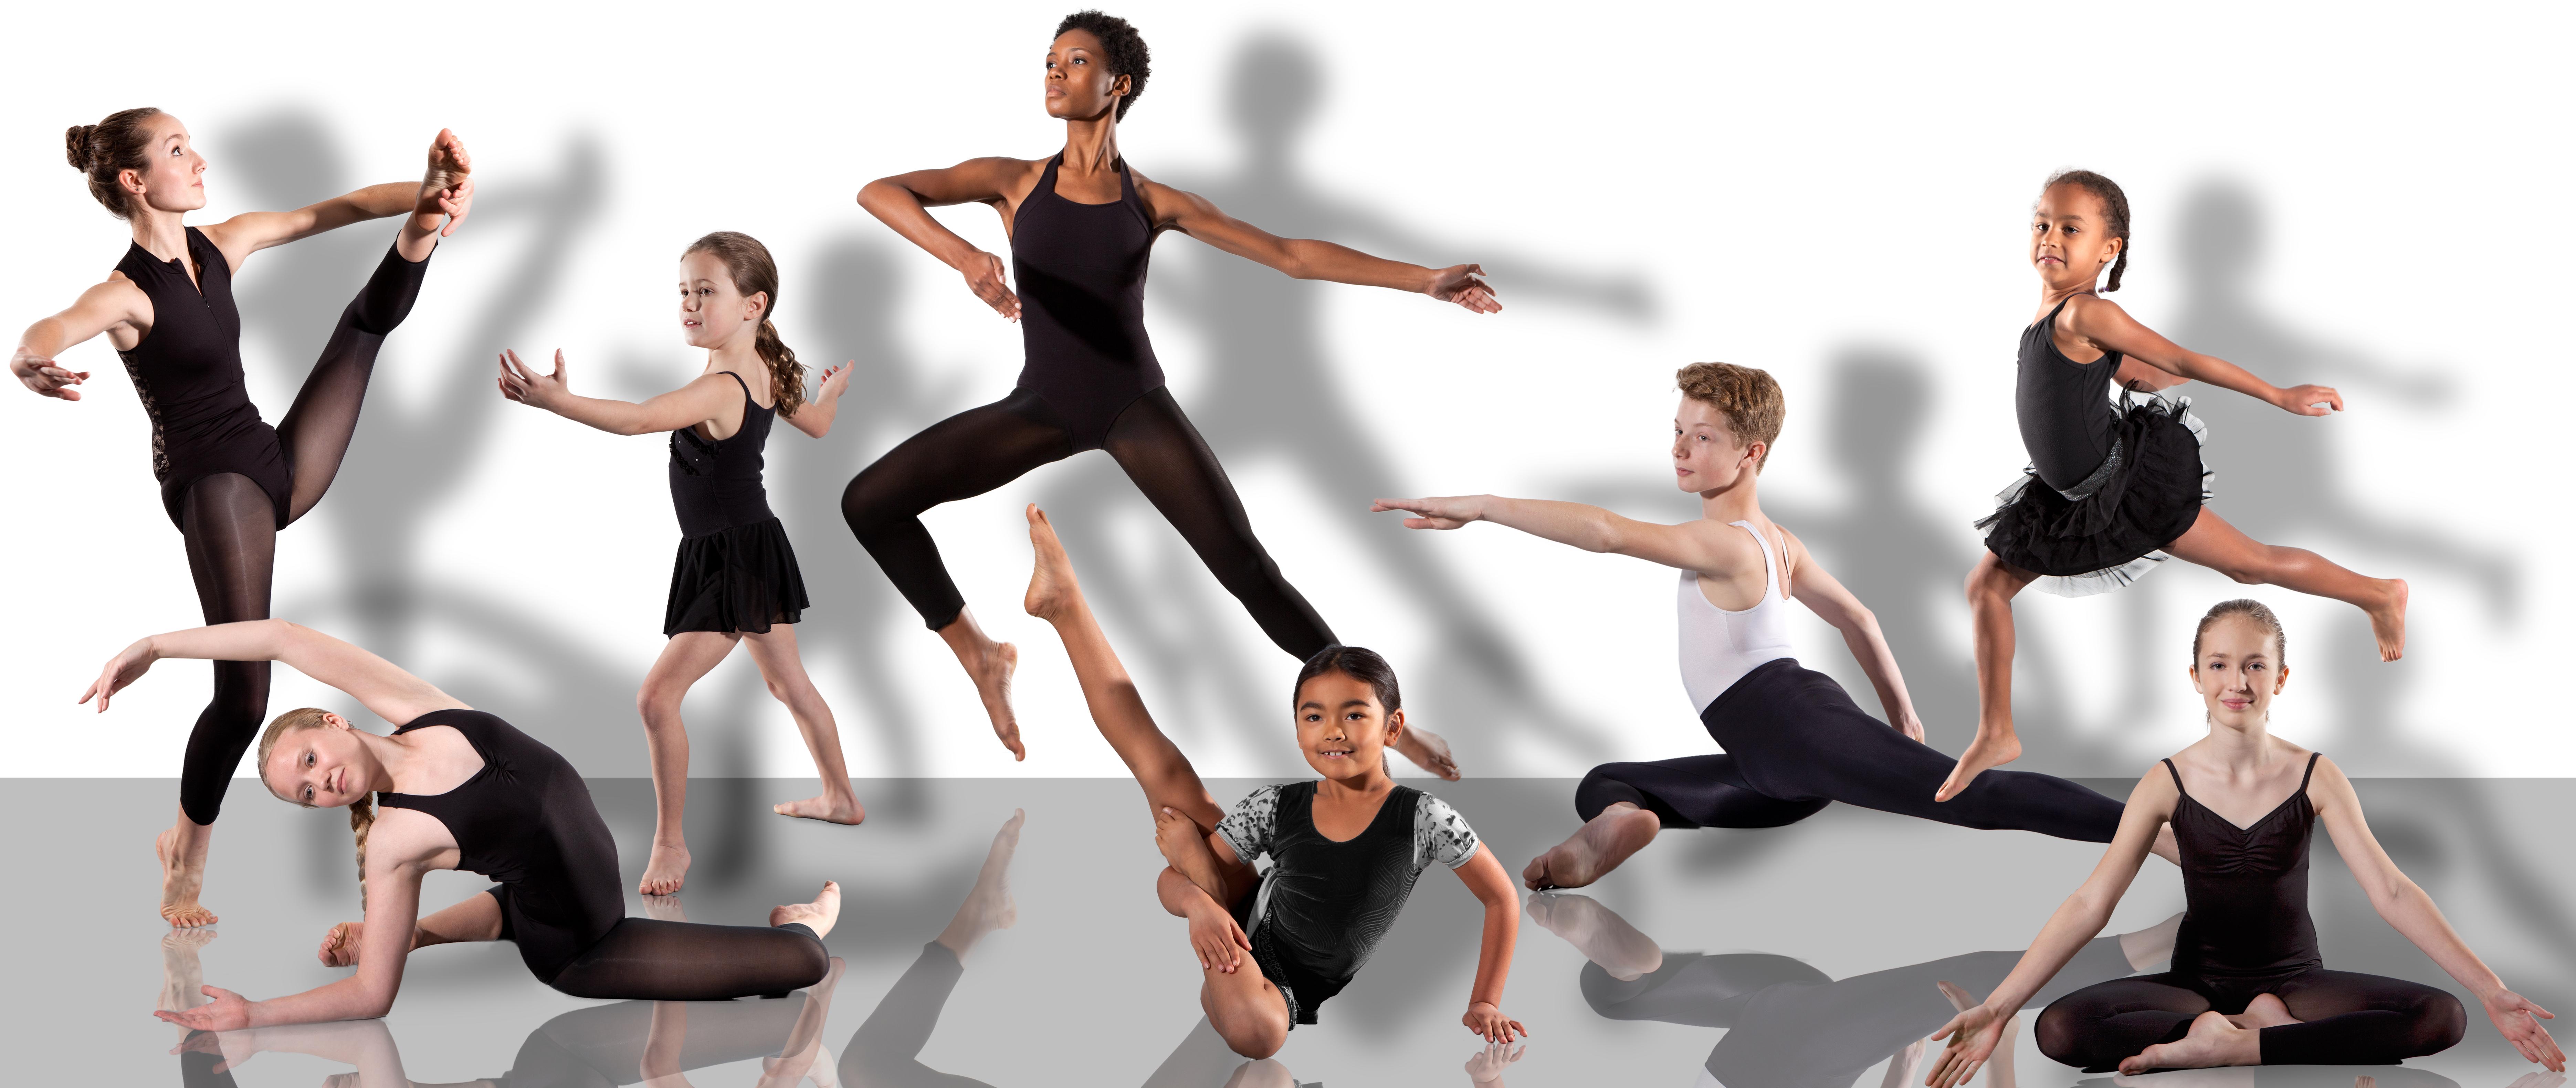 Kanopy Dance Summer Dance Camps 1 & 2, Dance Intensive, Summer Session  and Guest Artist Master Workshop